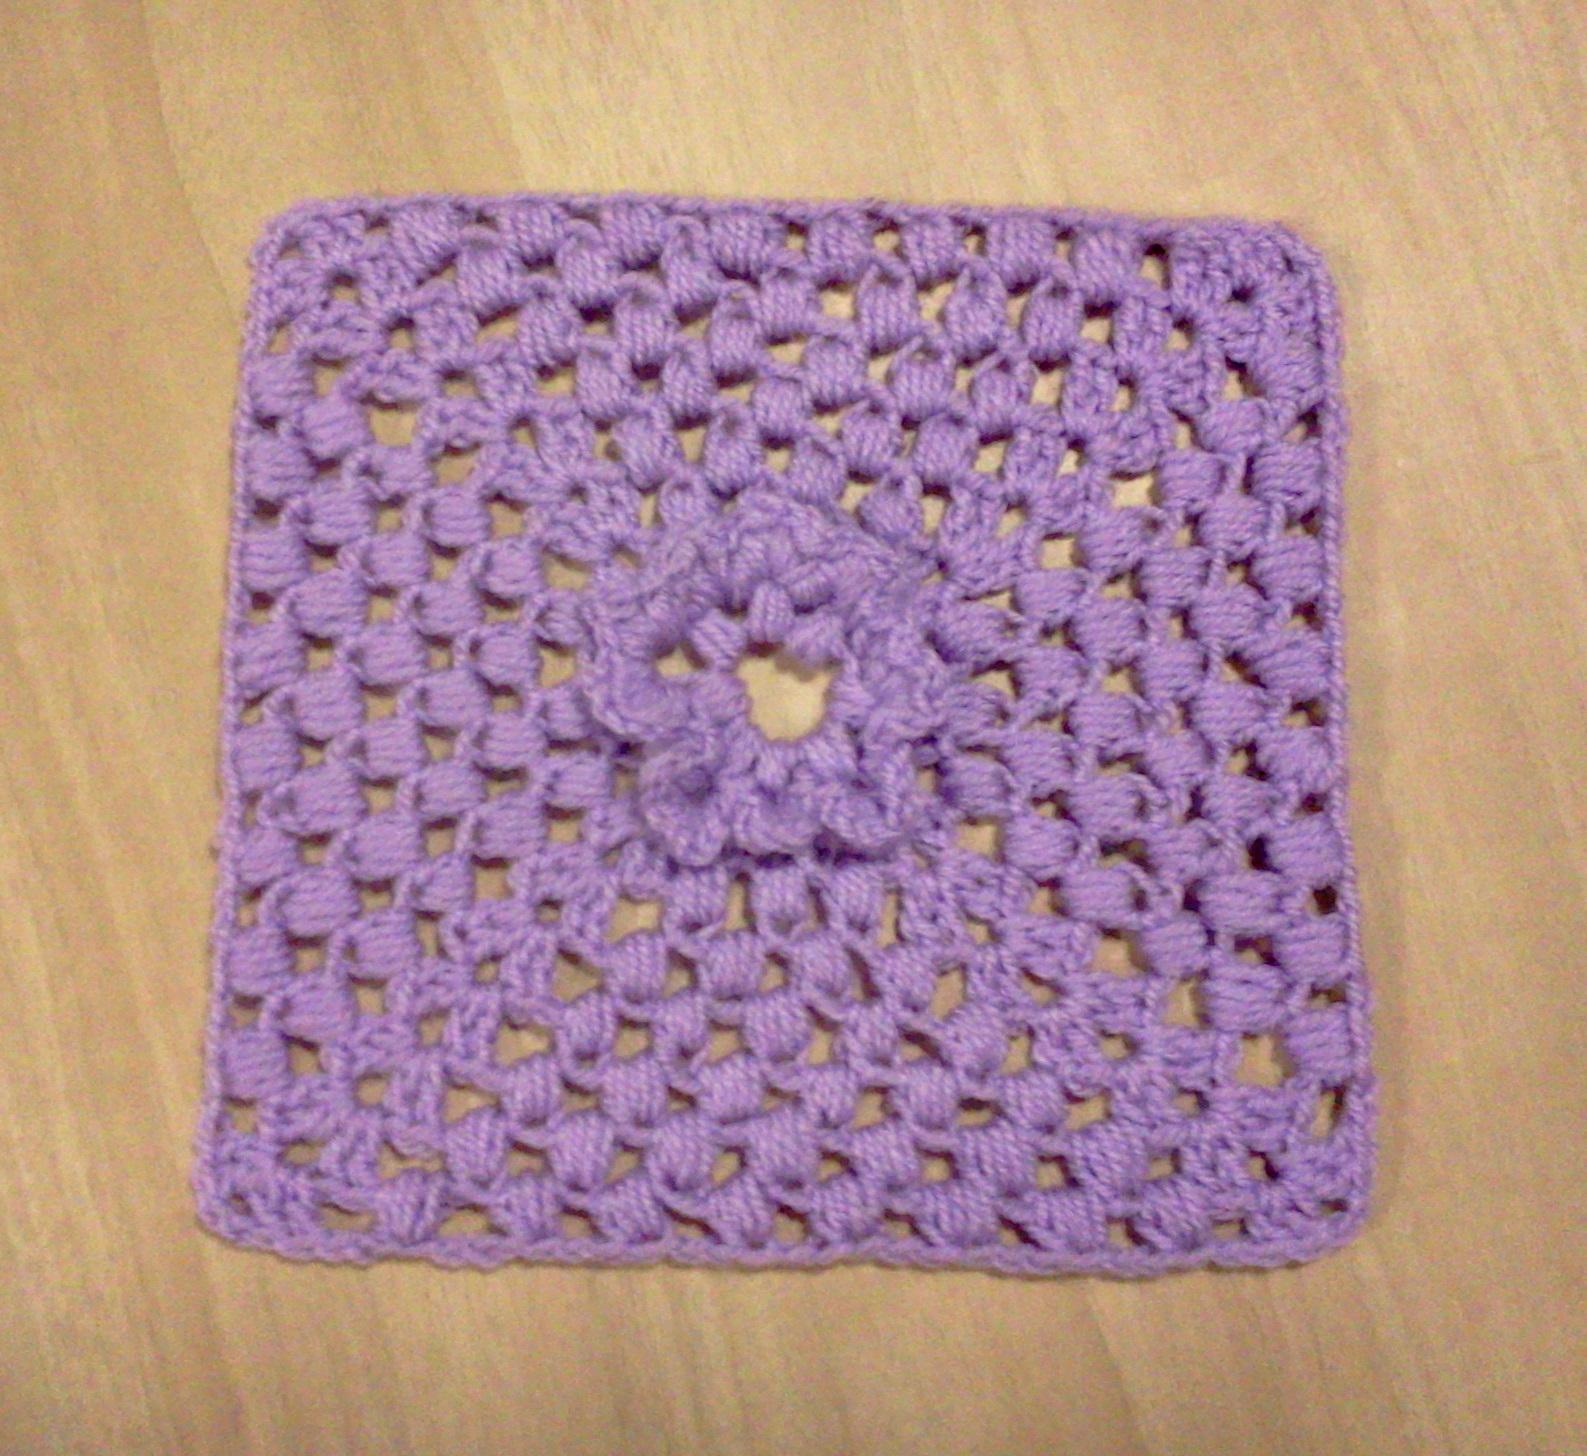 Crochet Stitch Yrh : ... stitch sts stitches sl st slip stitch tr trebble rep repeat yrh yarn